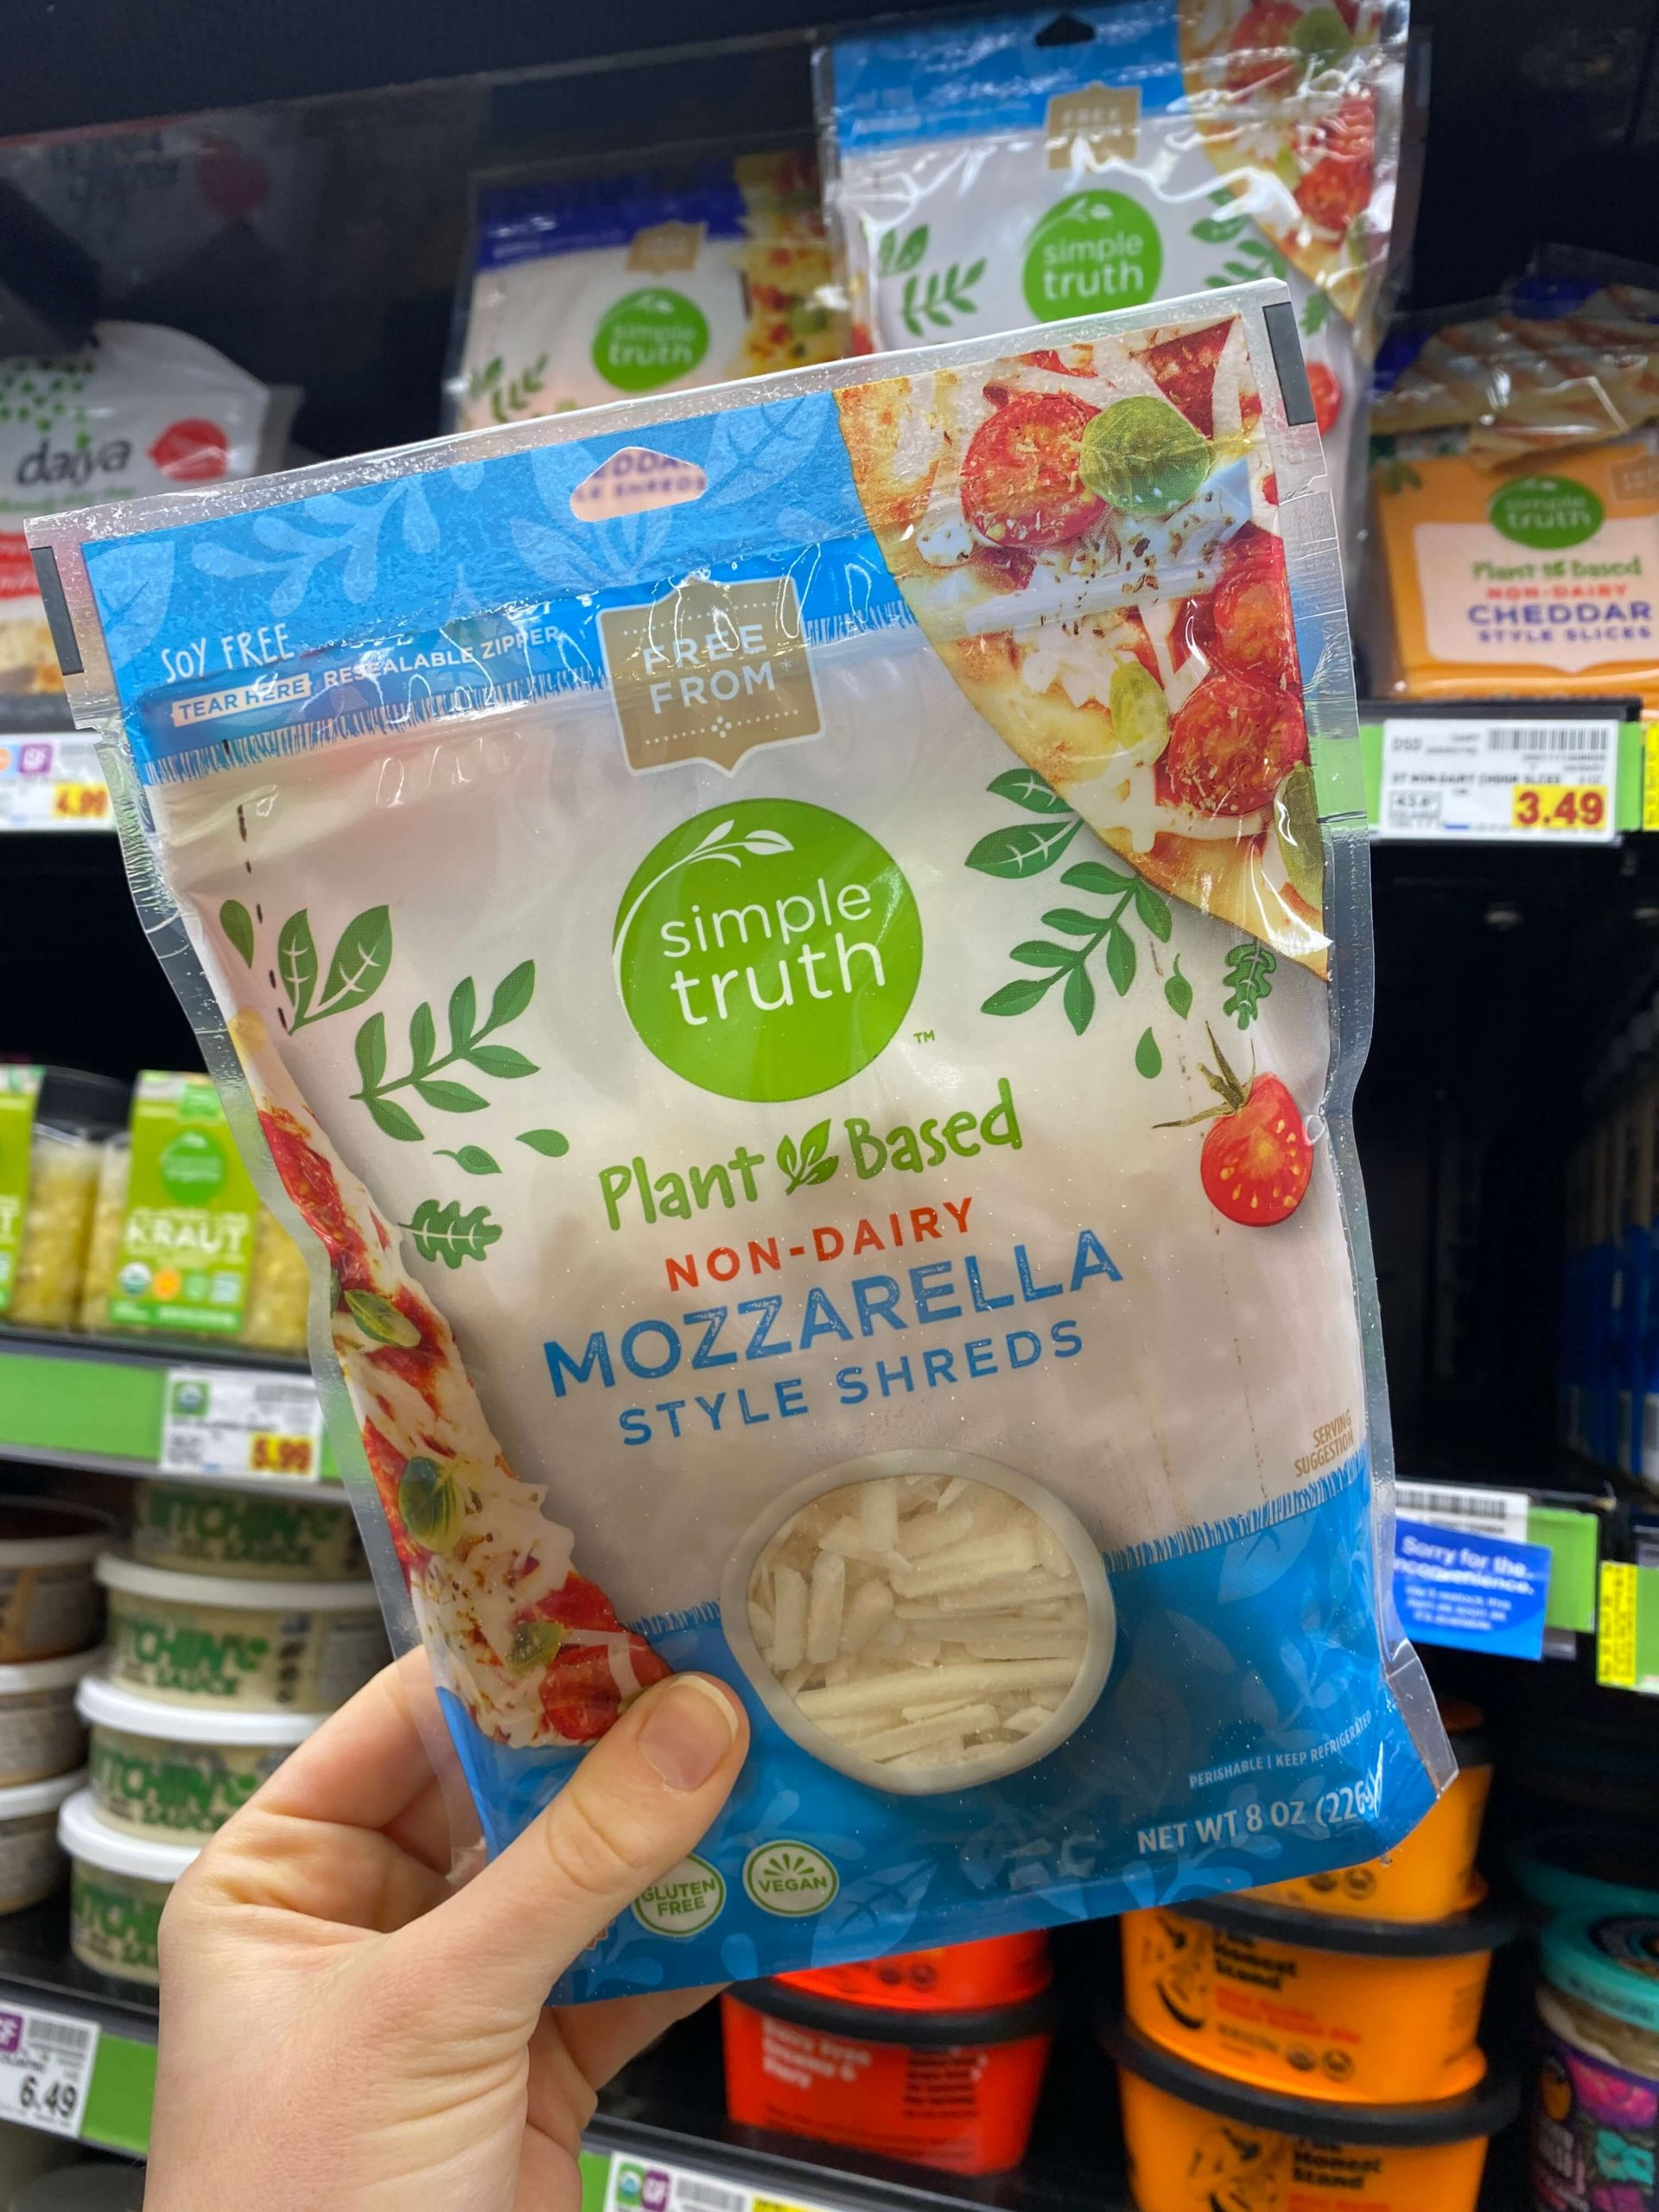 Non-Dairy Cheddar and Mozzarella Style Shreds